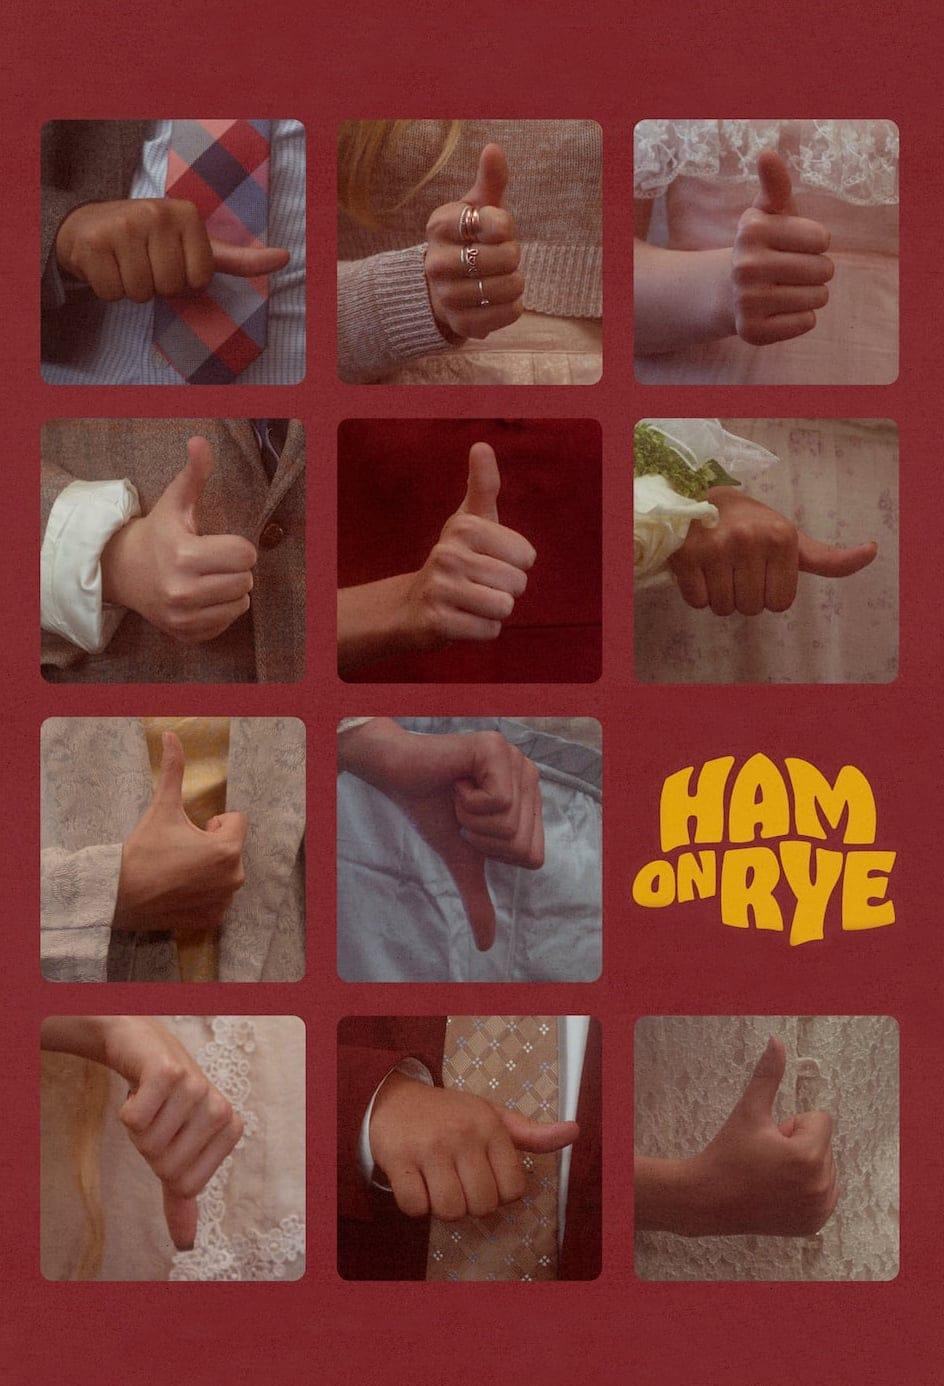 Poster for Ham on Rye